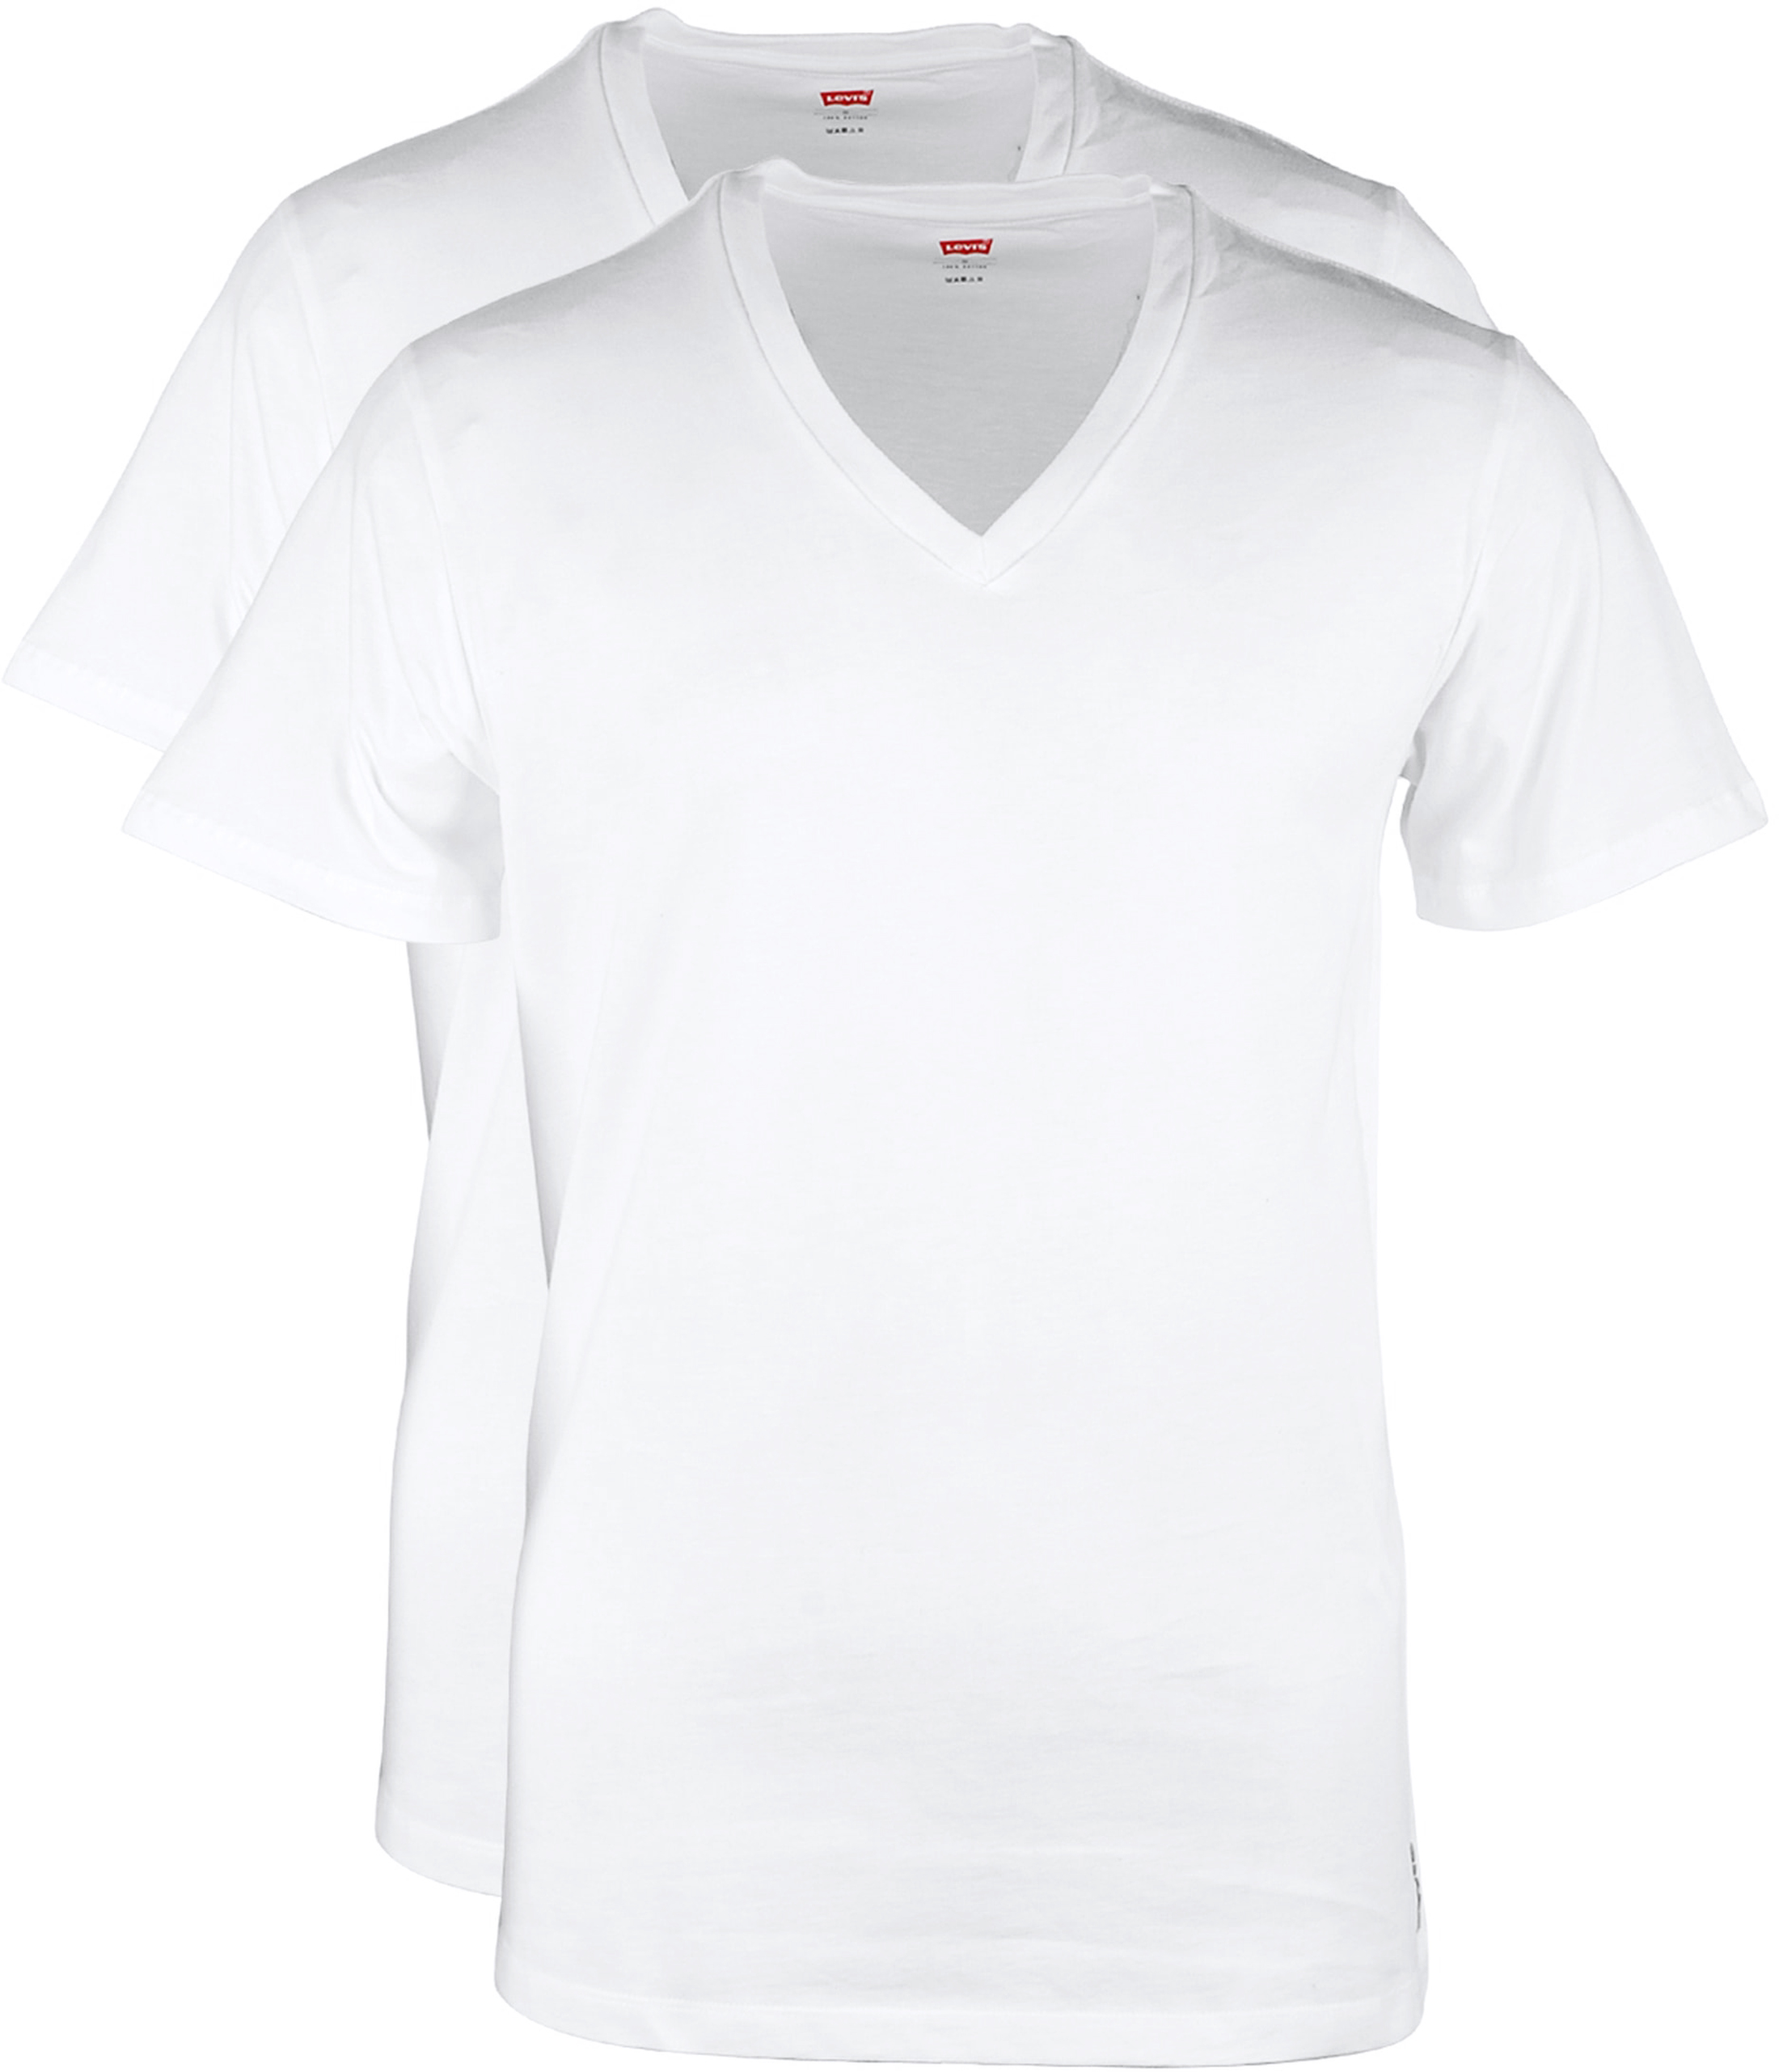 Levi's T-shirt V-Hals Wit 2Pack foto 0